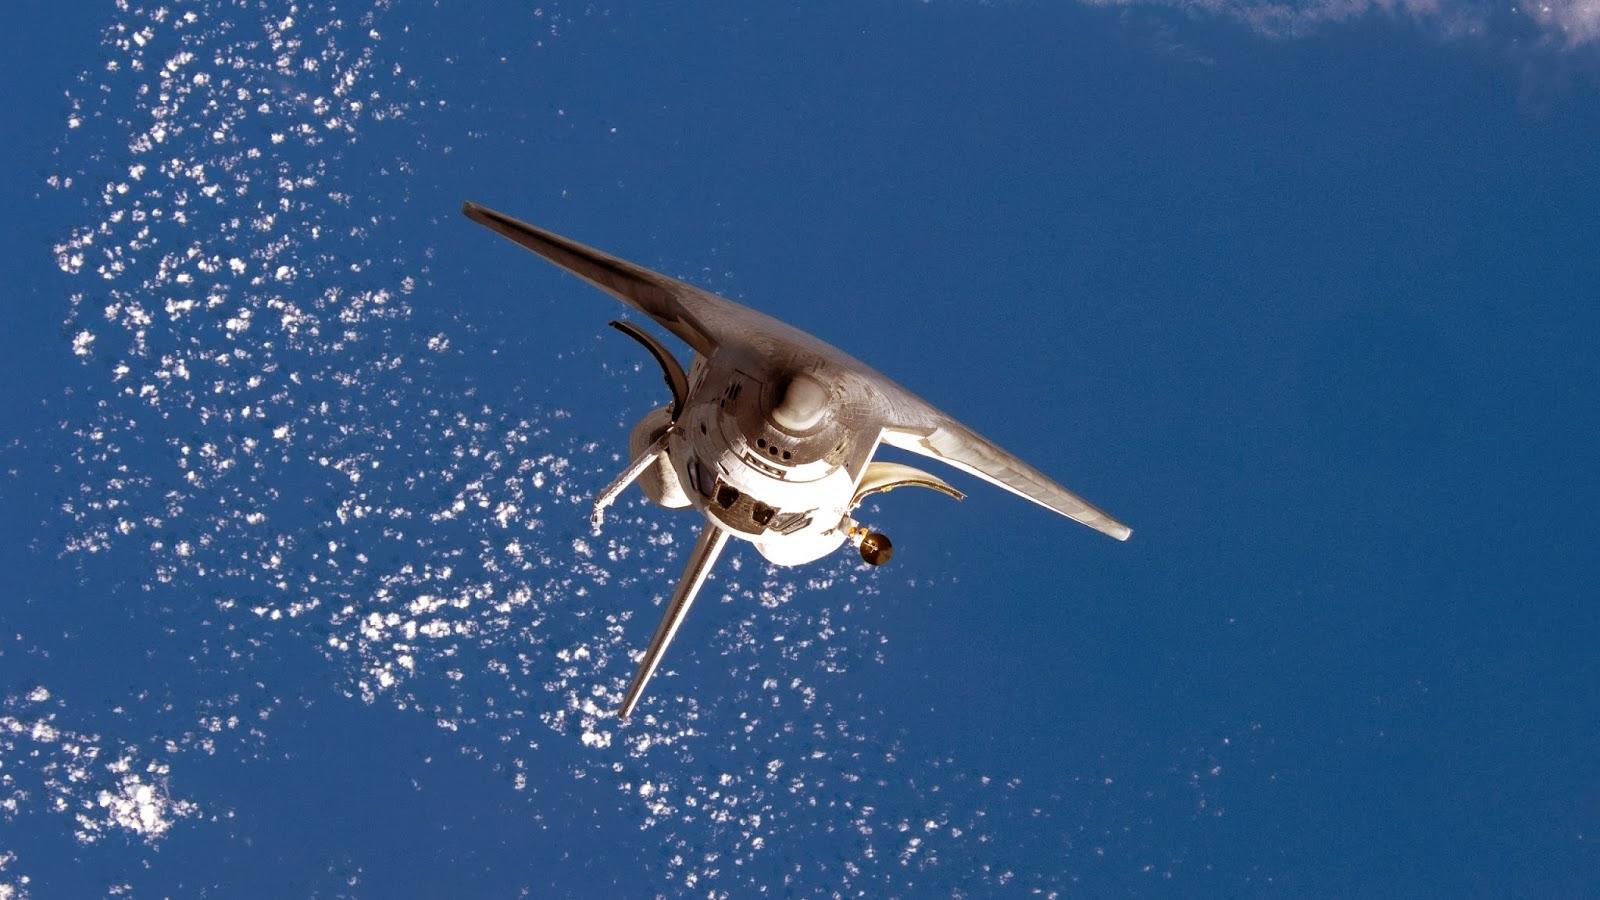 space shuttle columbia disastro - photo #14